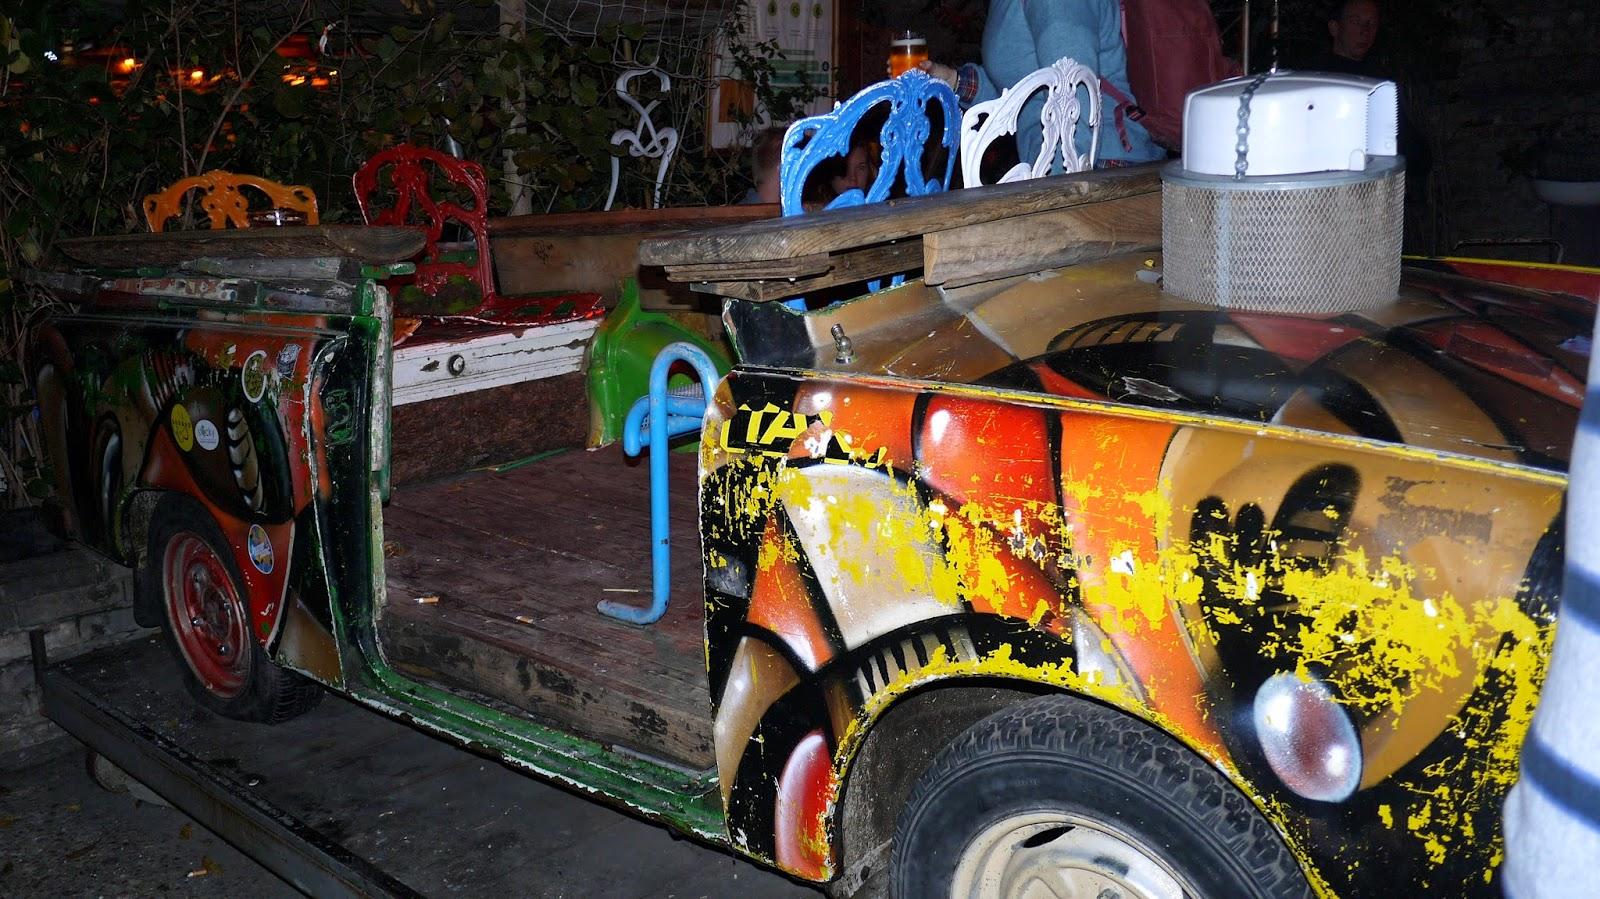 Szimpla Kert budapest ruin bar jeep car